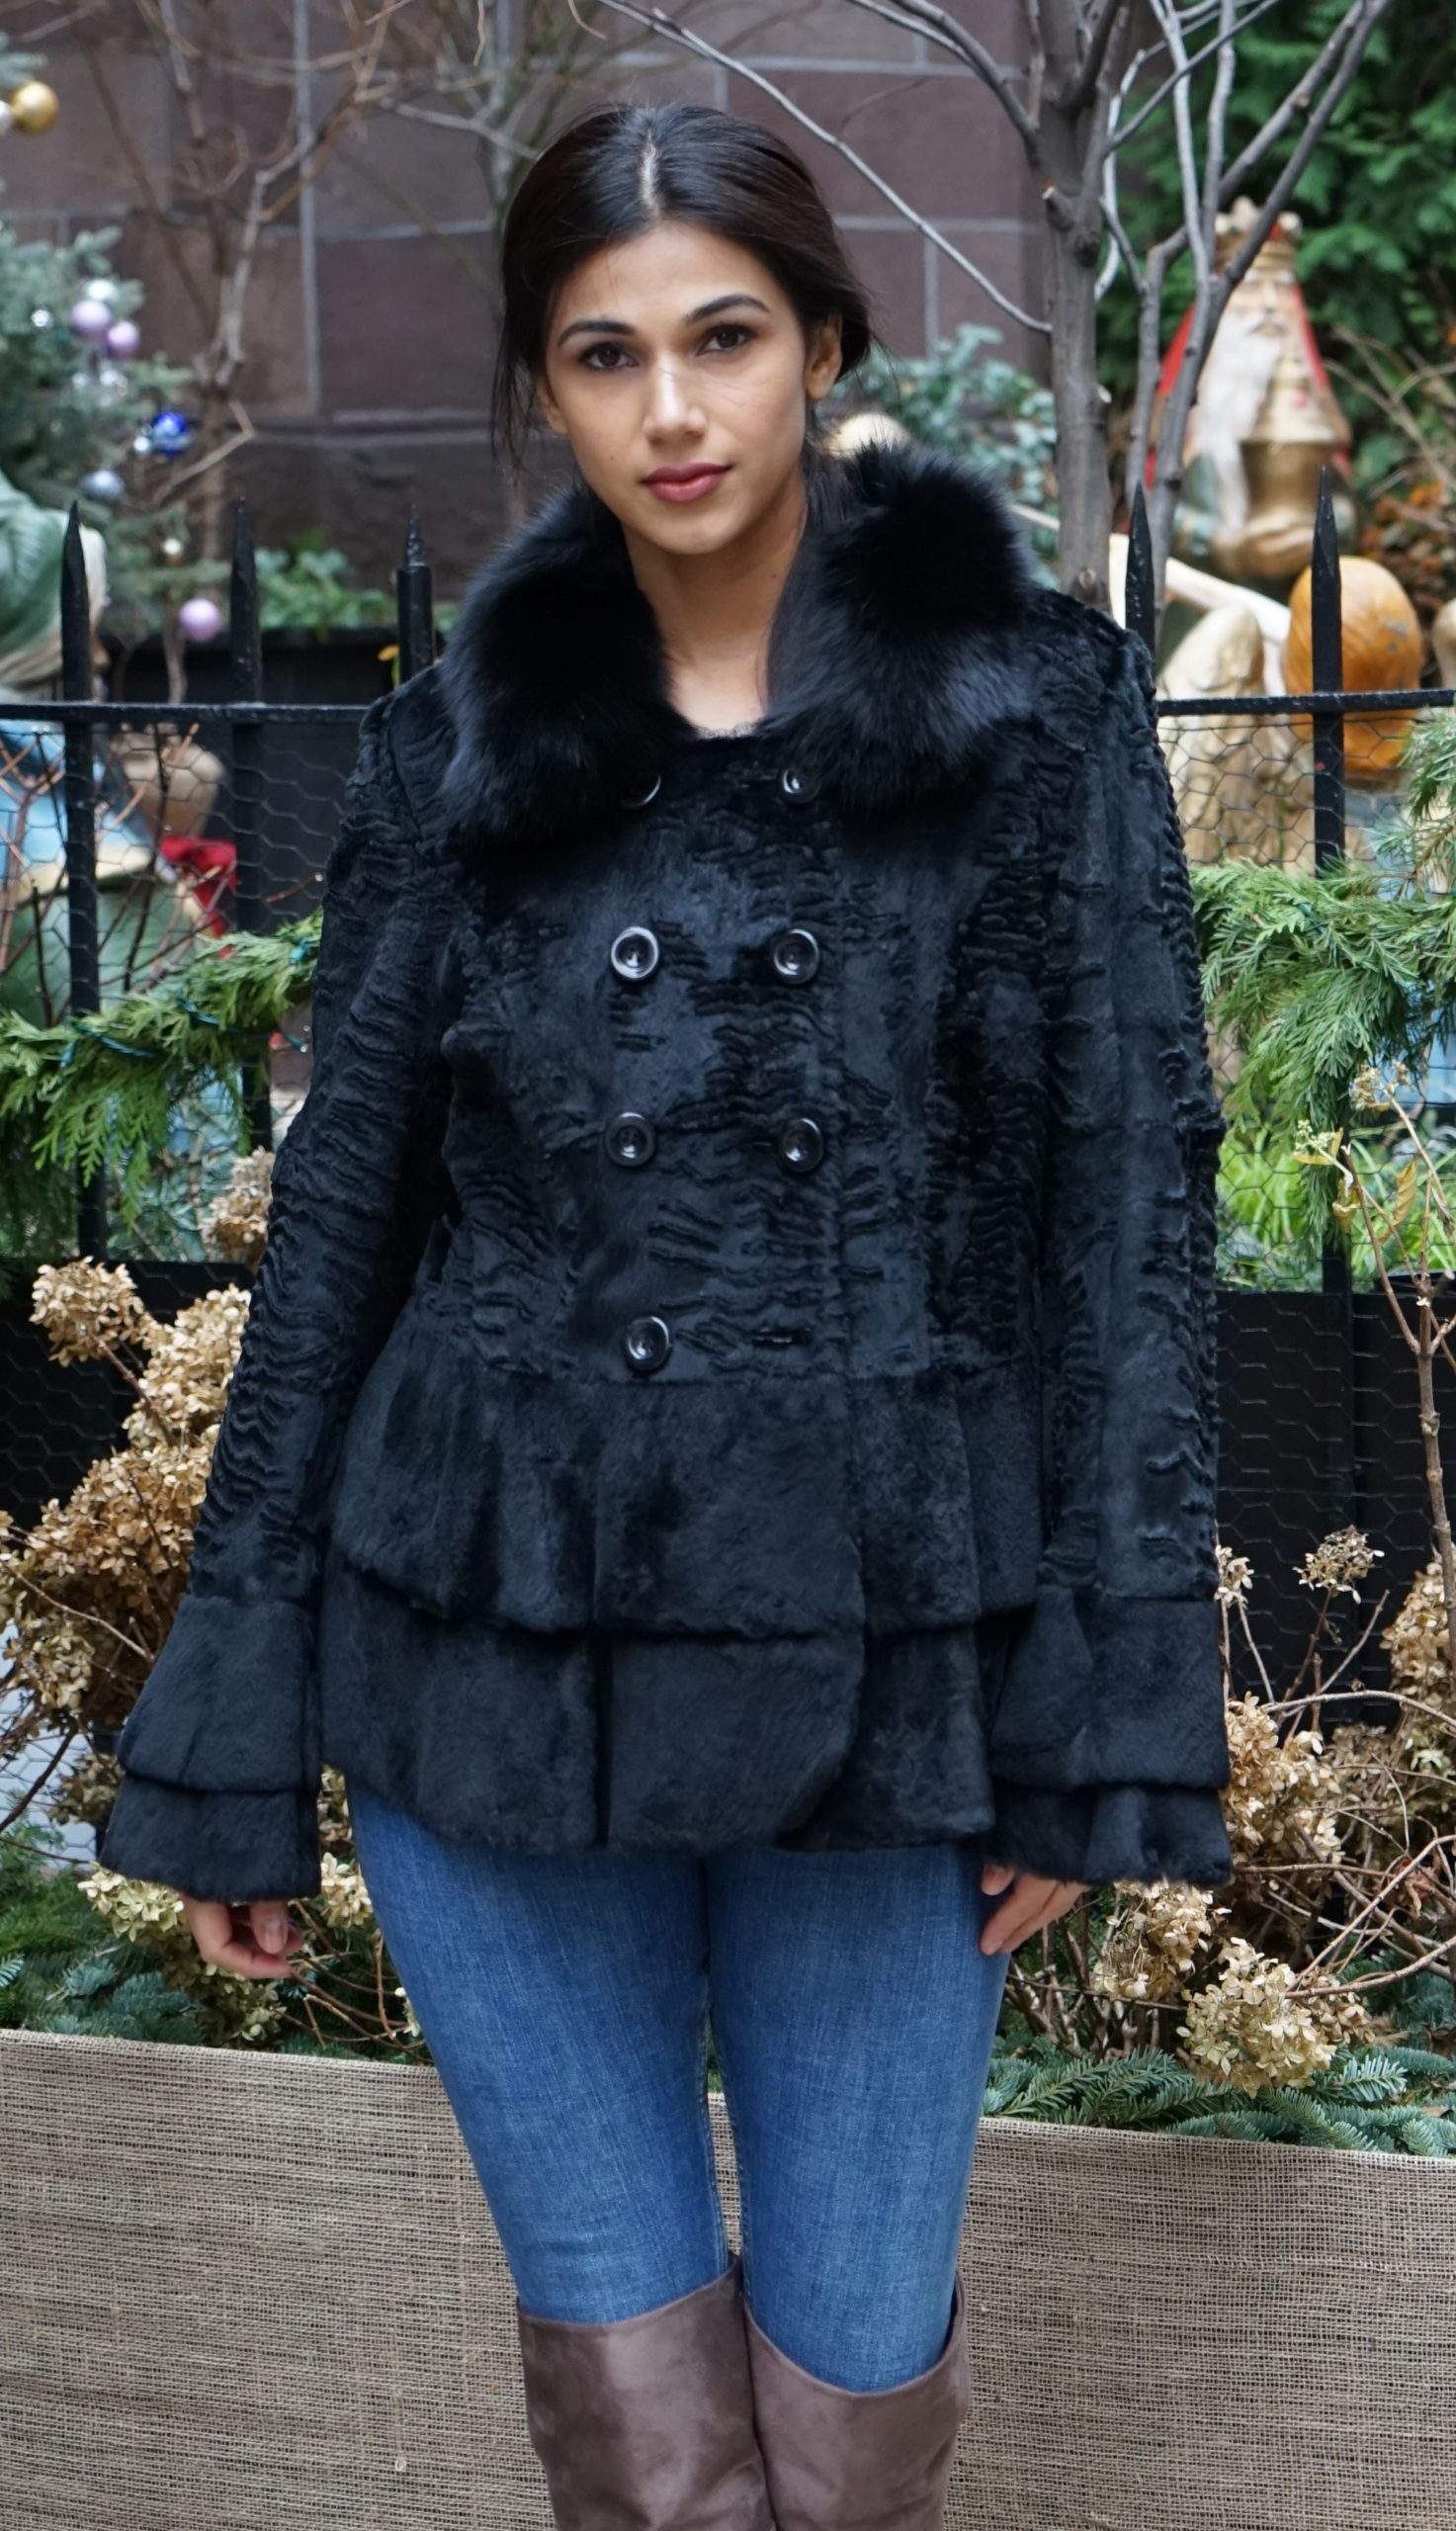 Black Sheared Rabbit Stroller